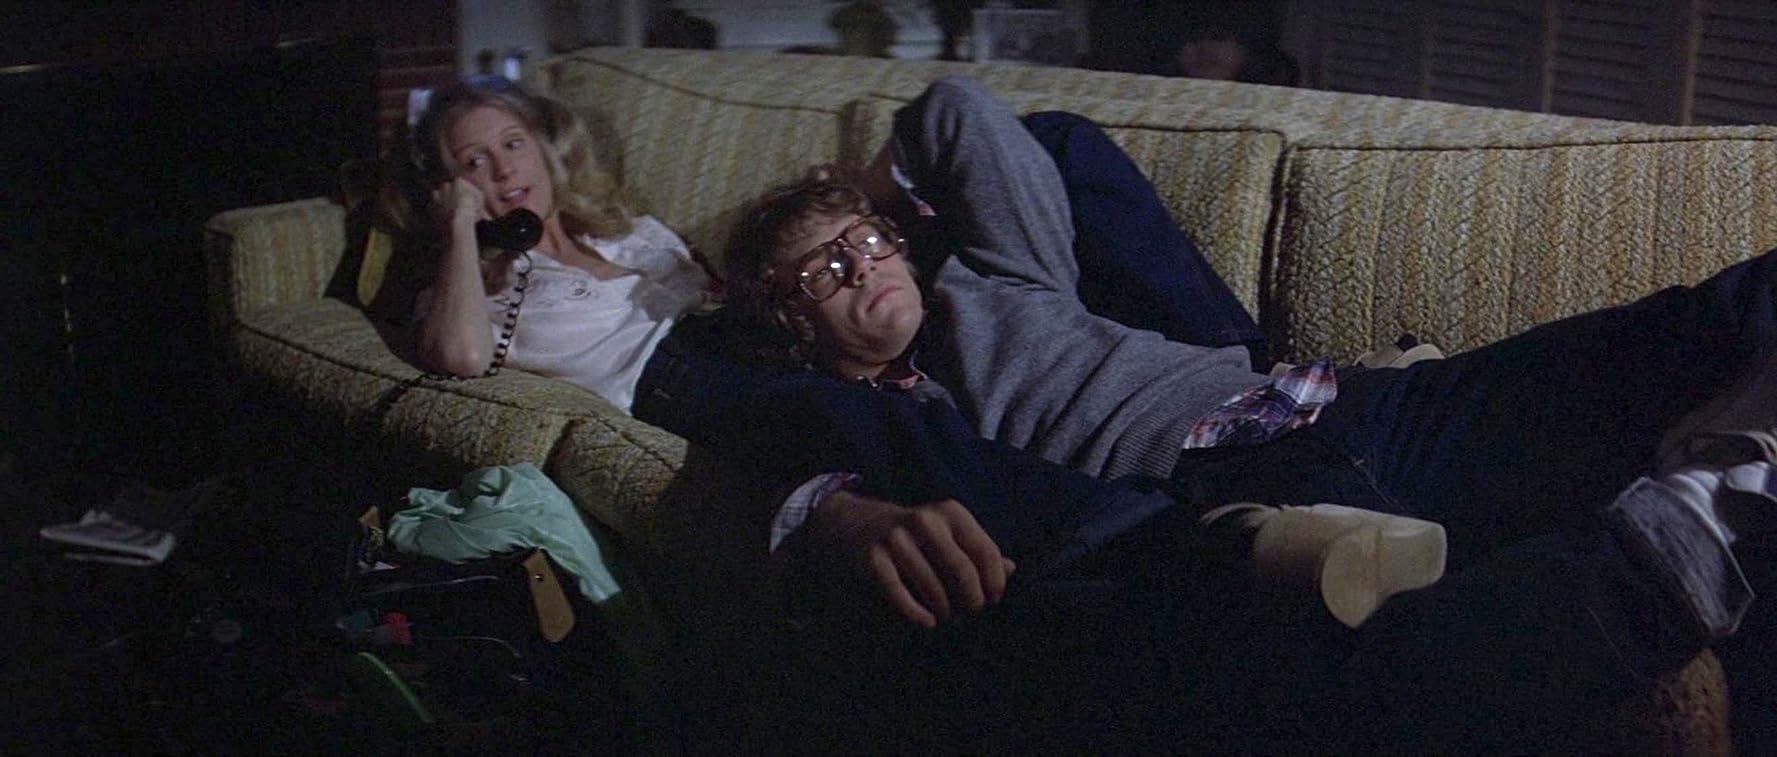 P.J. Soles and John Michael Graham in Halloween (1978)